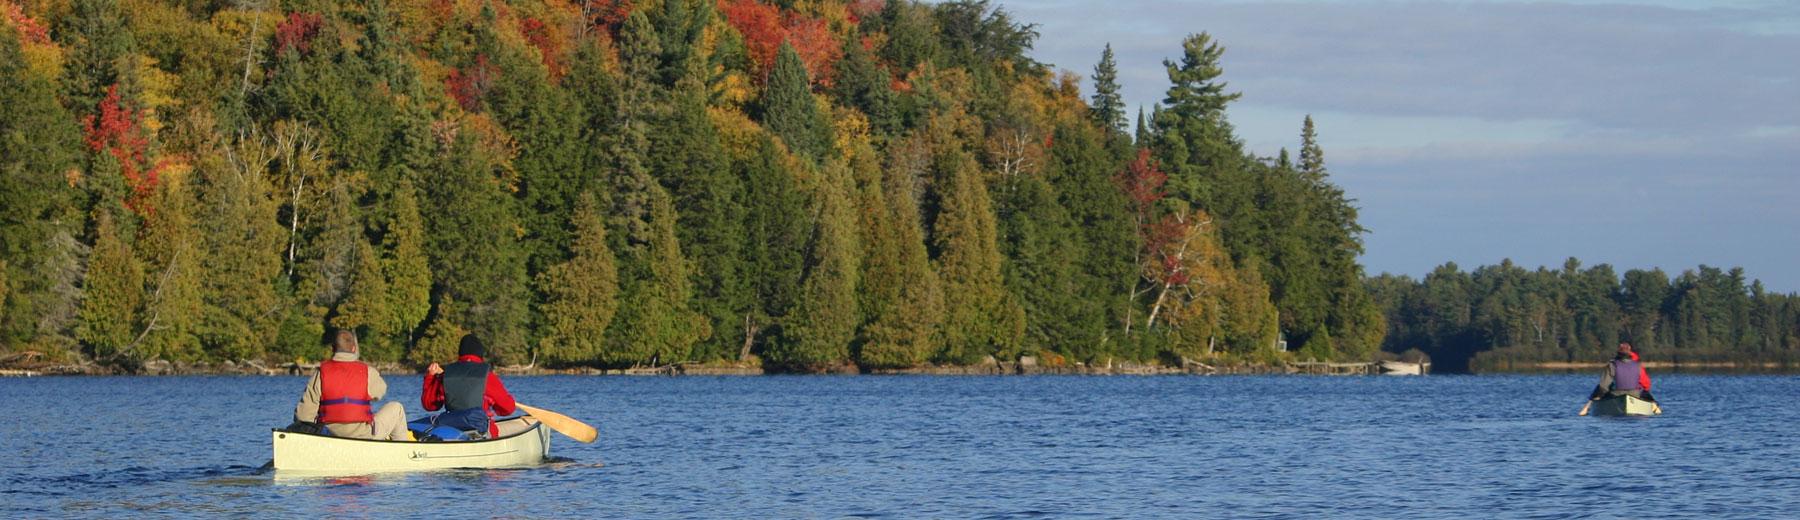 Canoers in Algonquin Park, Ontario